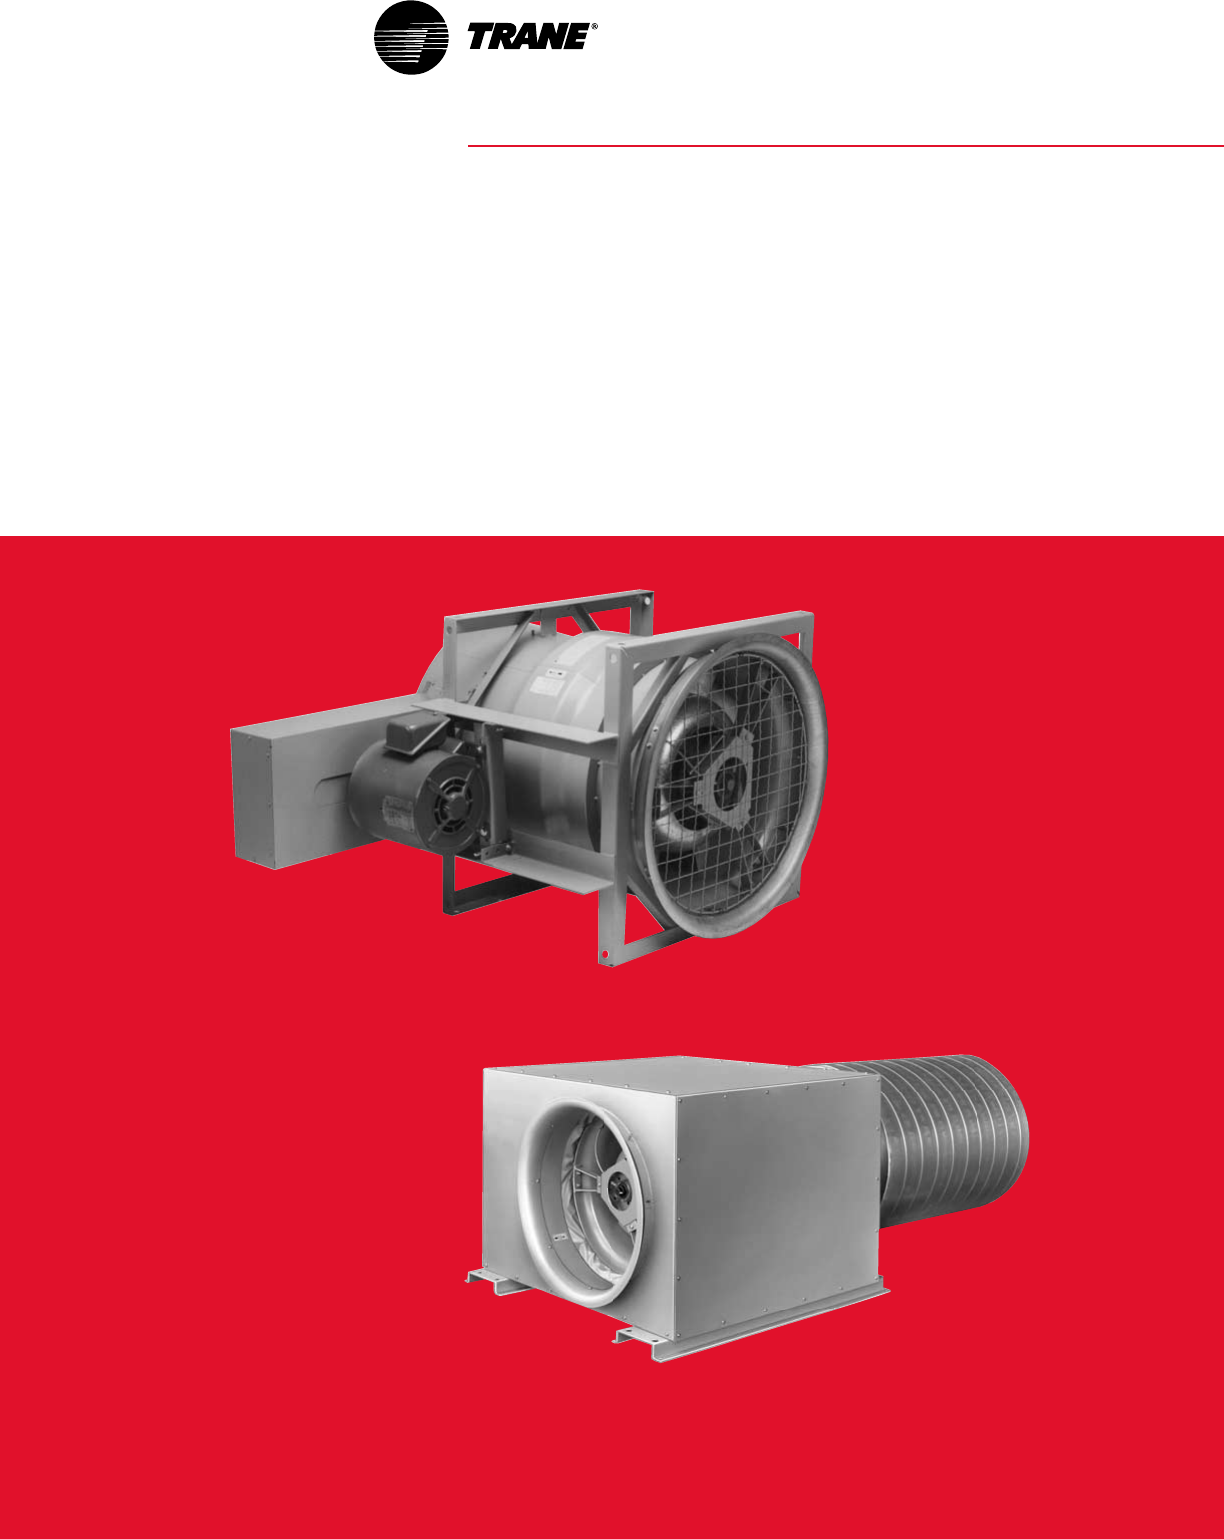 Trane Q Super Ii Users Manual 35376 Fands2 Magnetek Power Converter 3200 Wiring Diagram